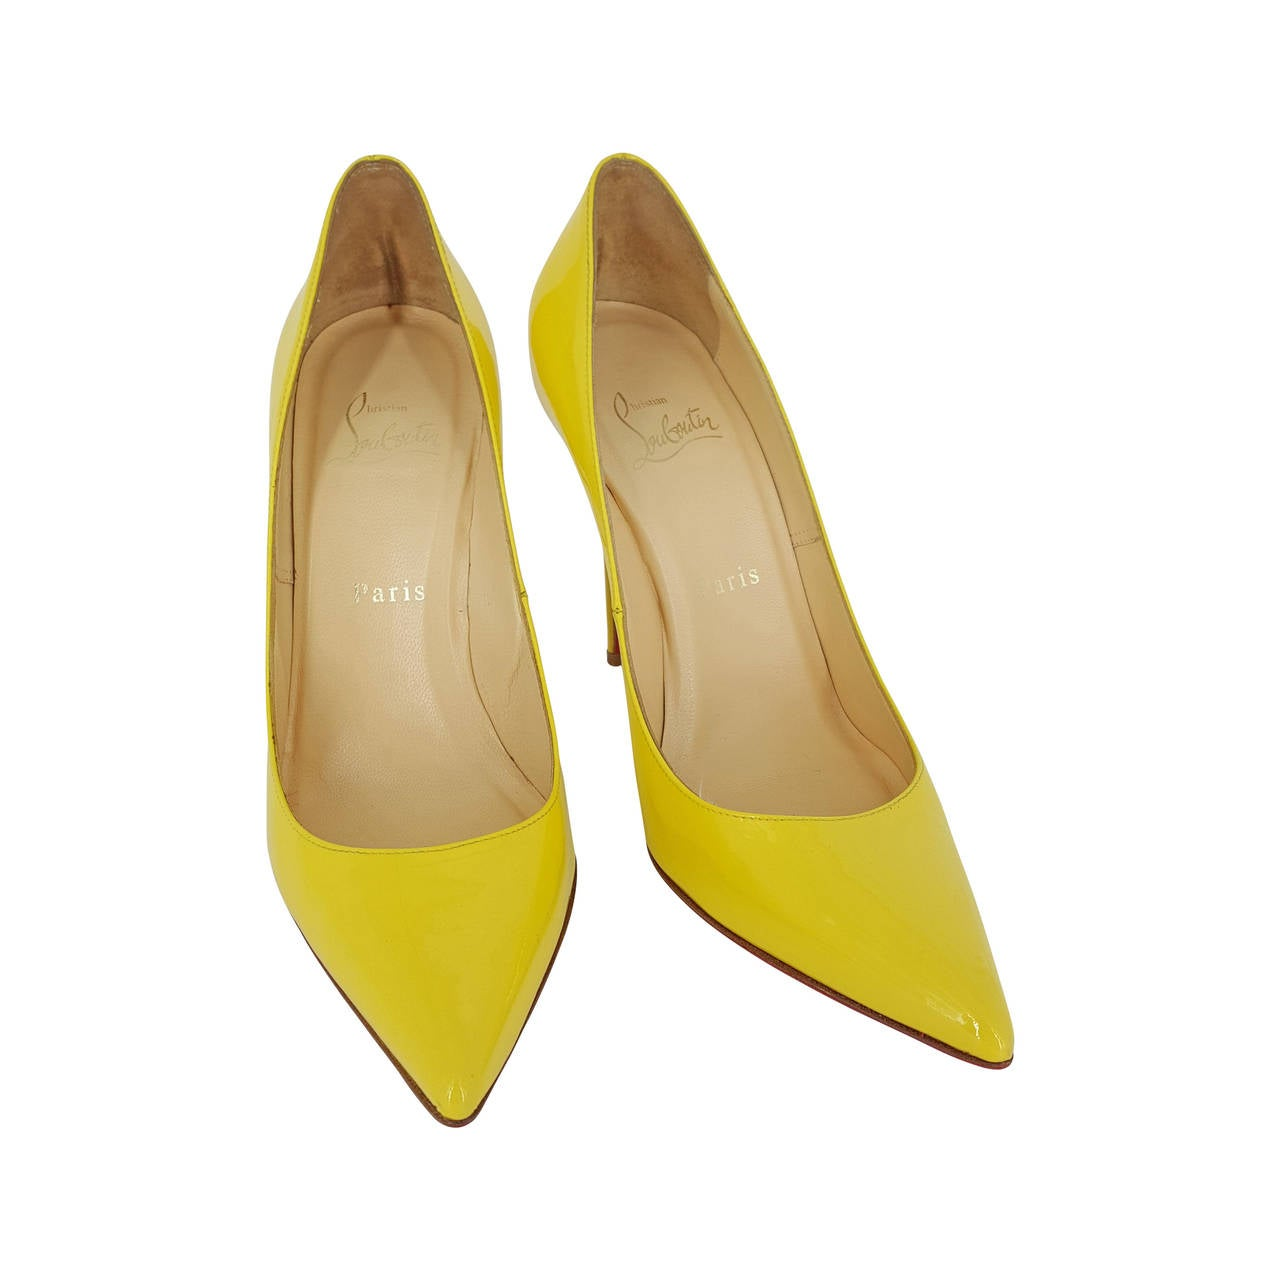 Christian Louboutin Bright Yellow High Heel Pumps Size 38 1